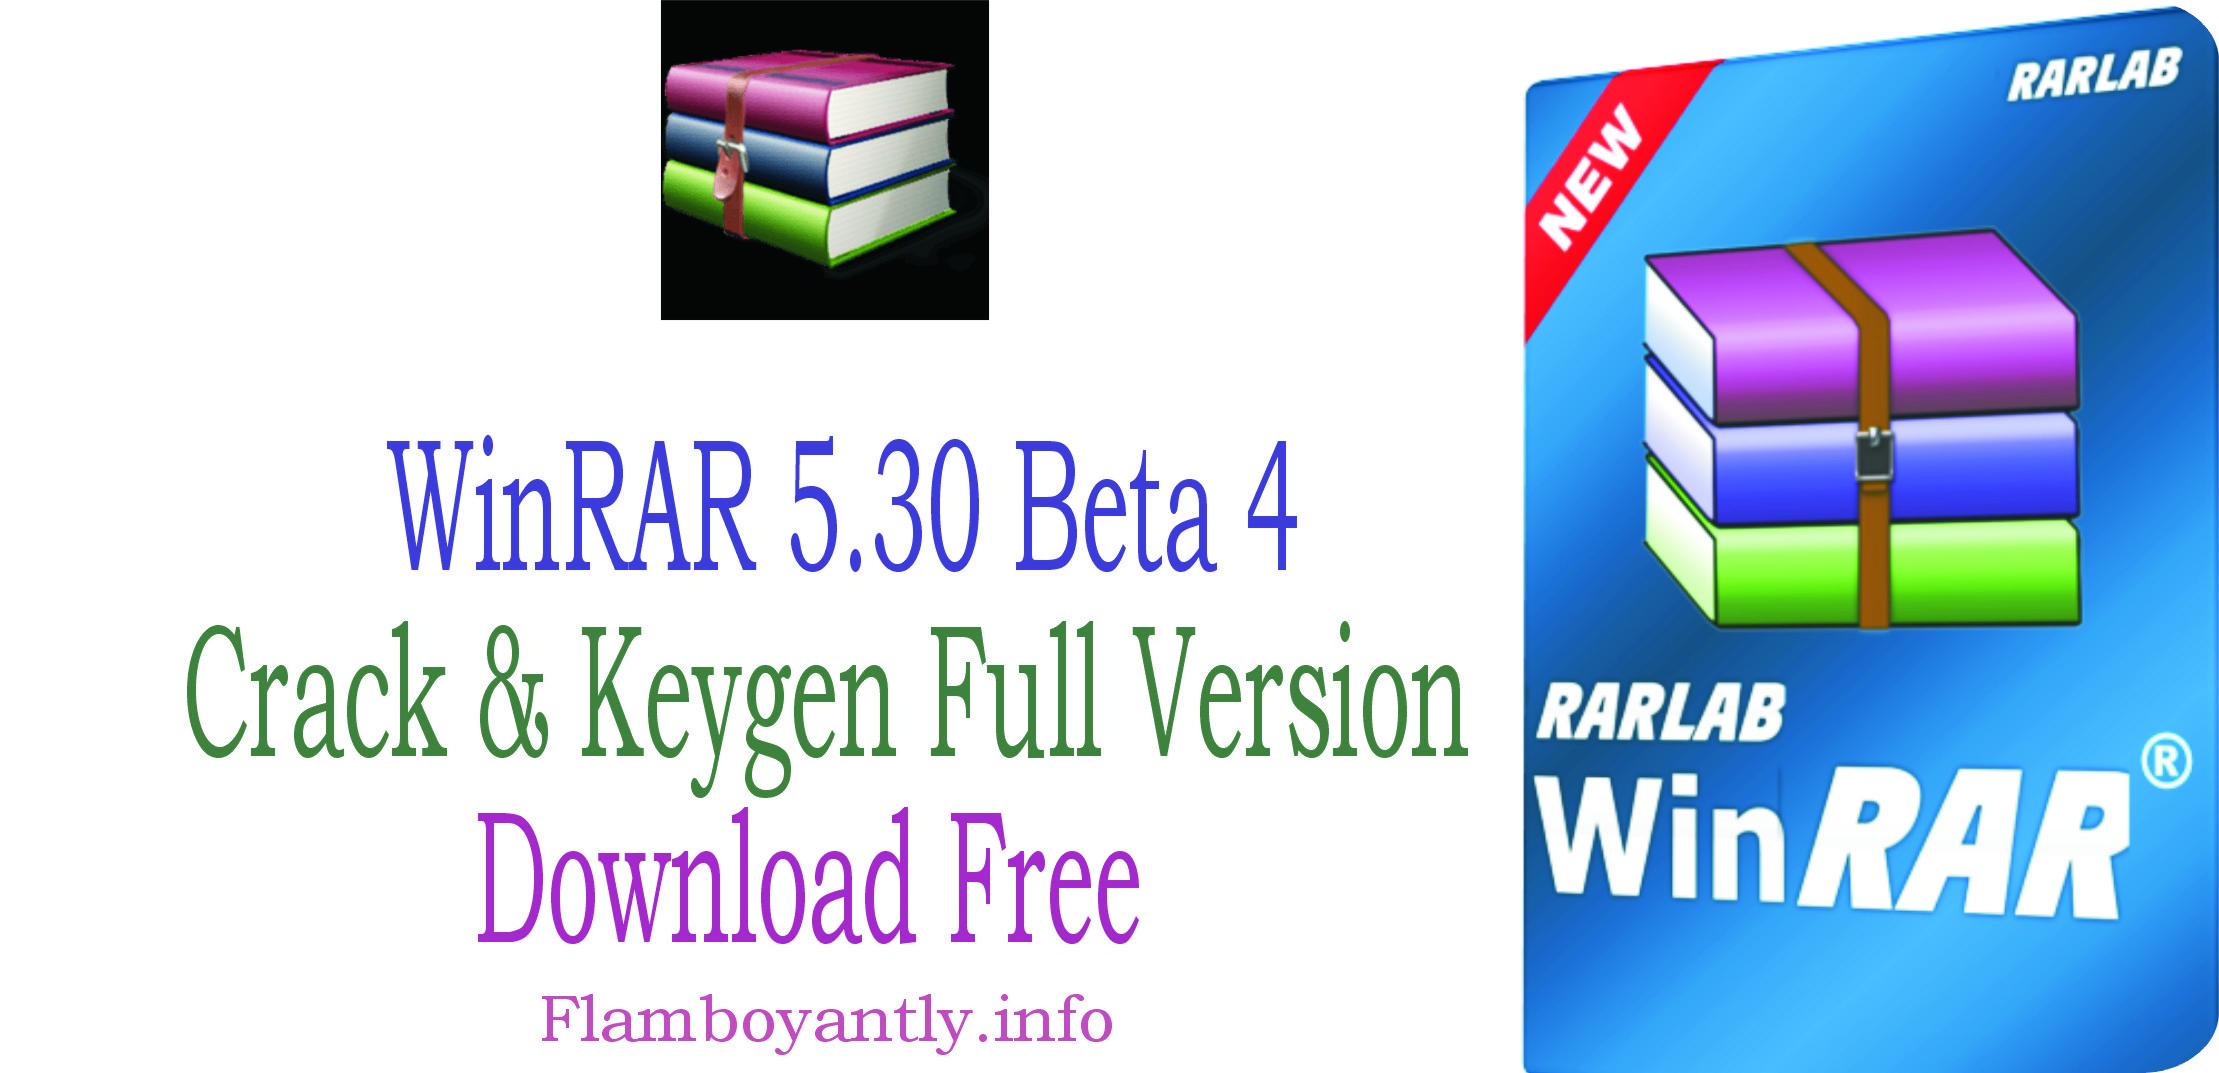 winrar full free download